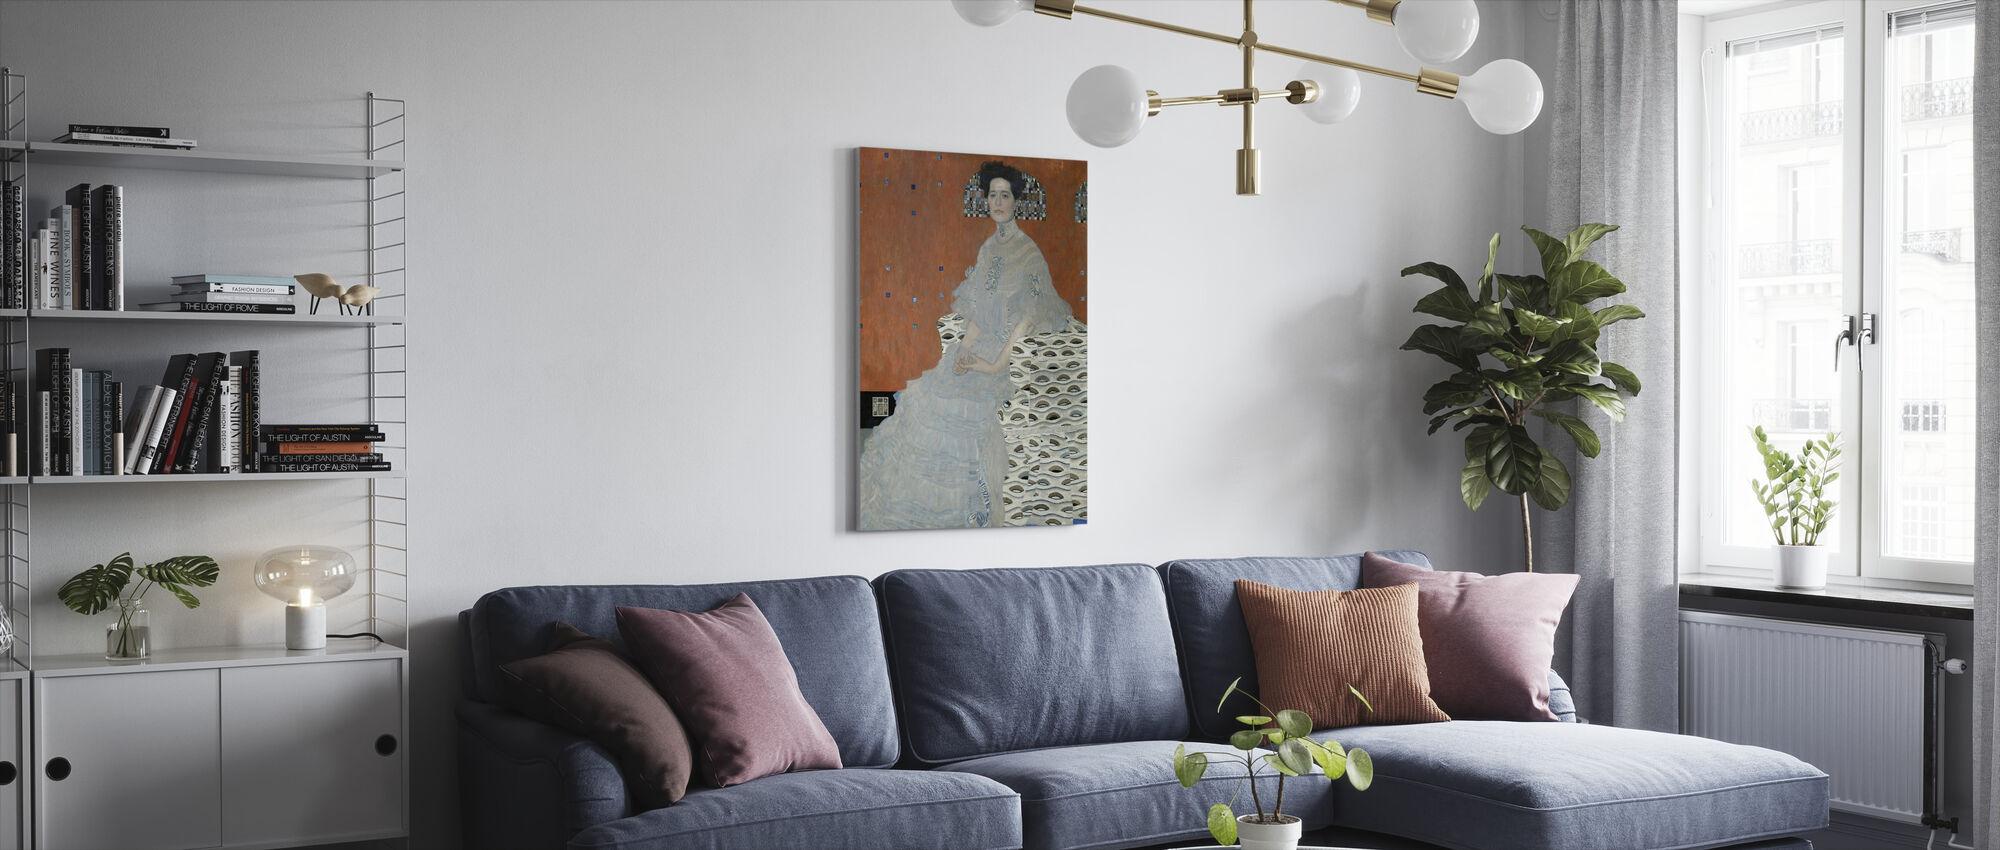 Fritza Riedler - Gustav Klimt - Canvastaulu - Olohuone